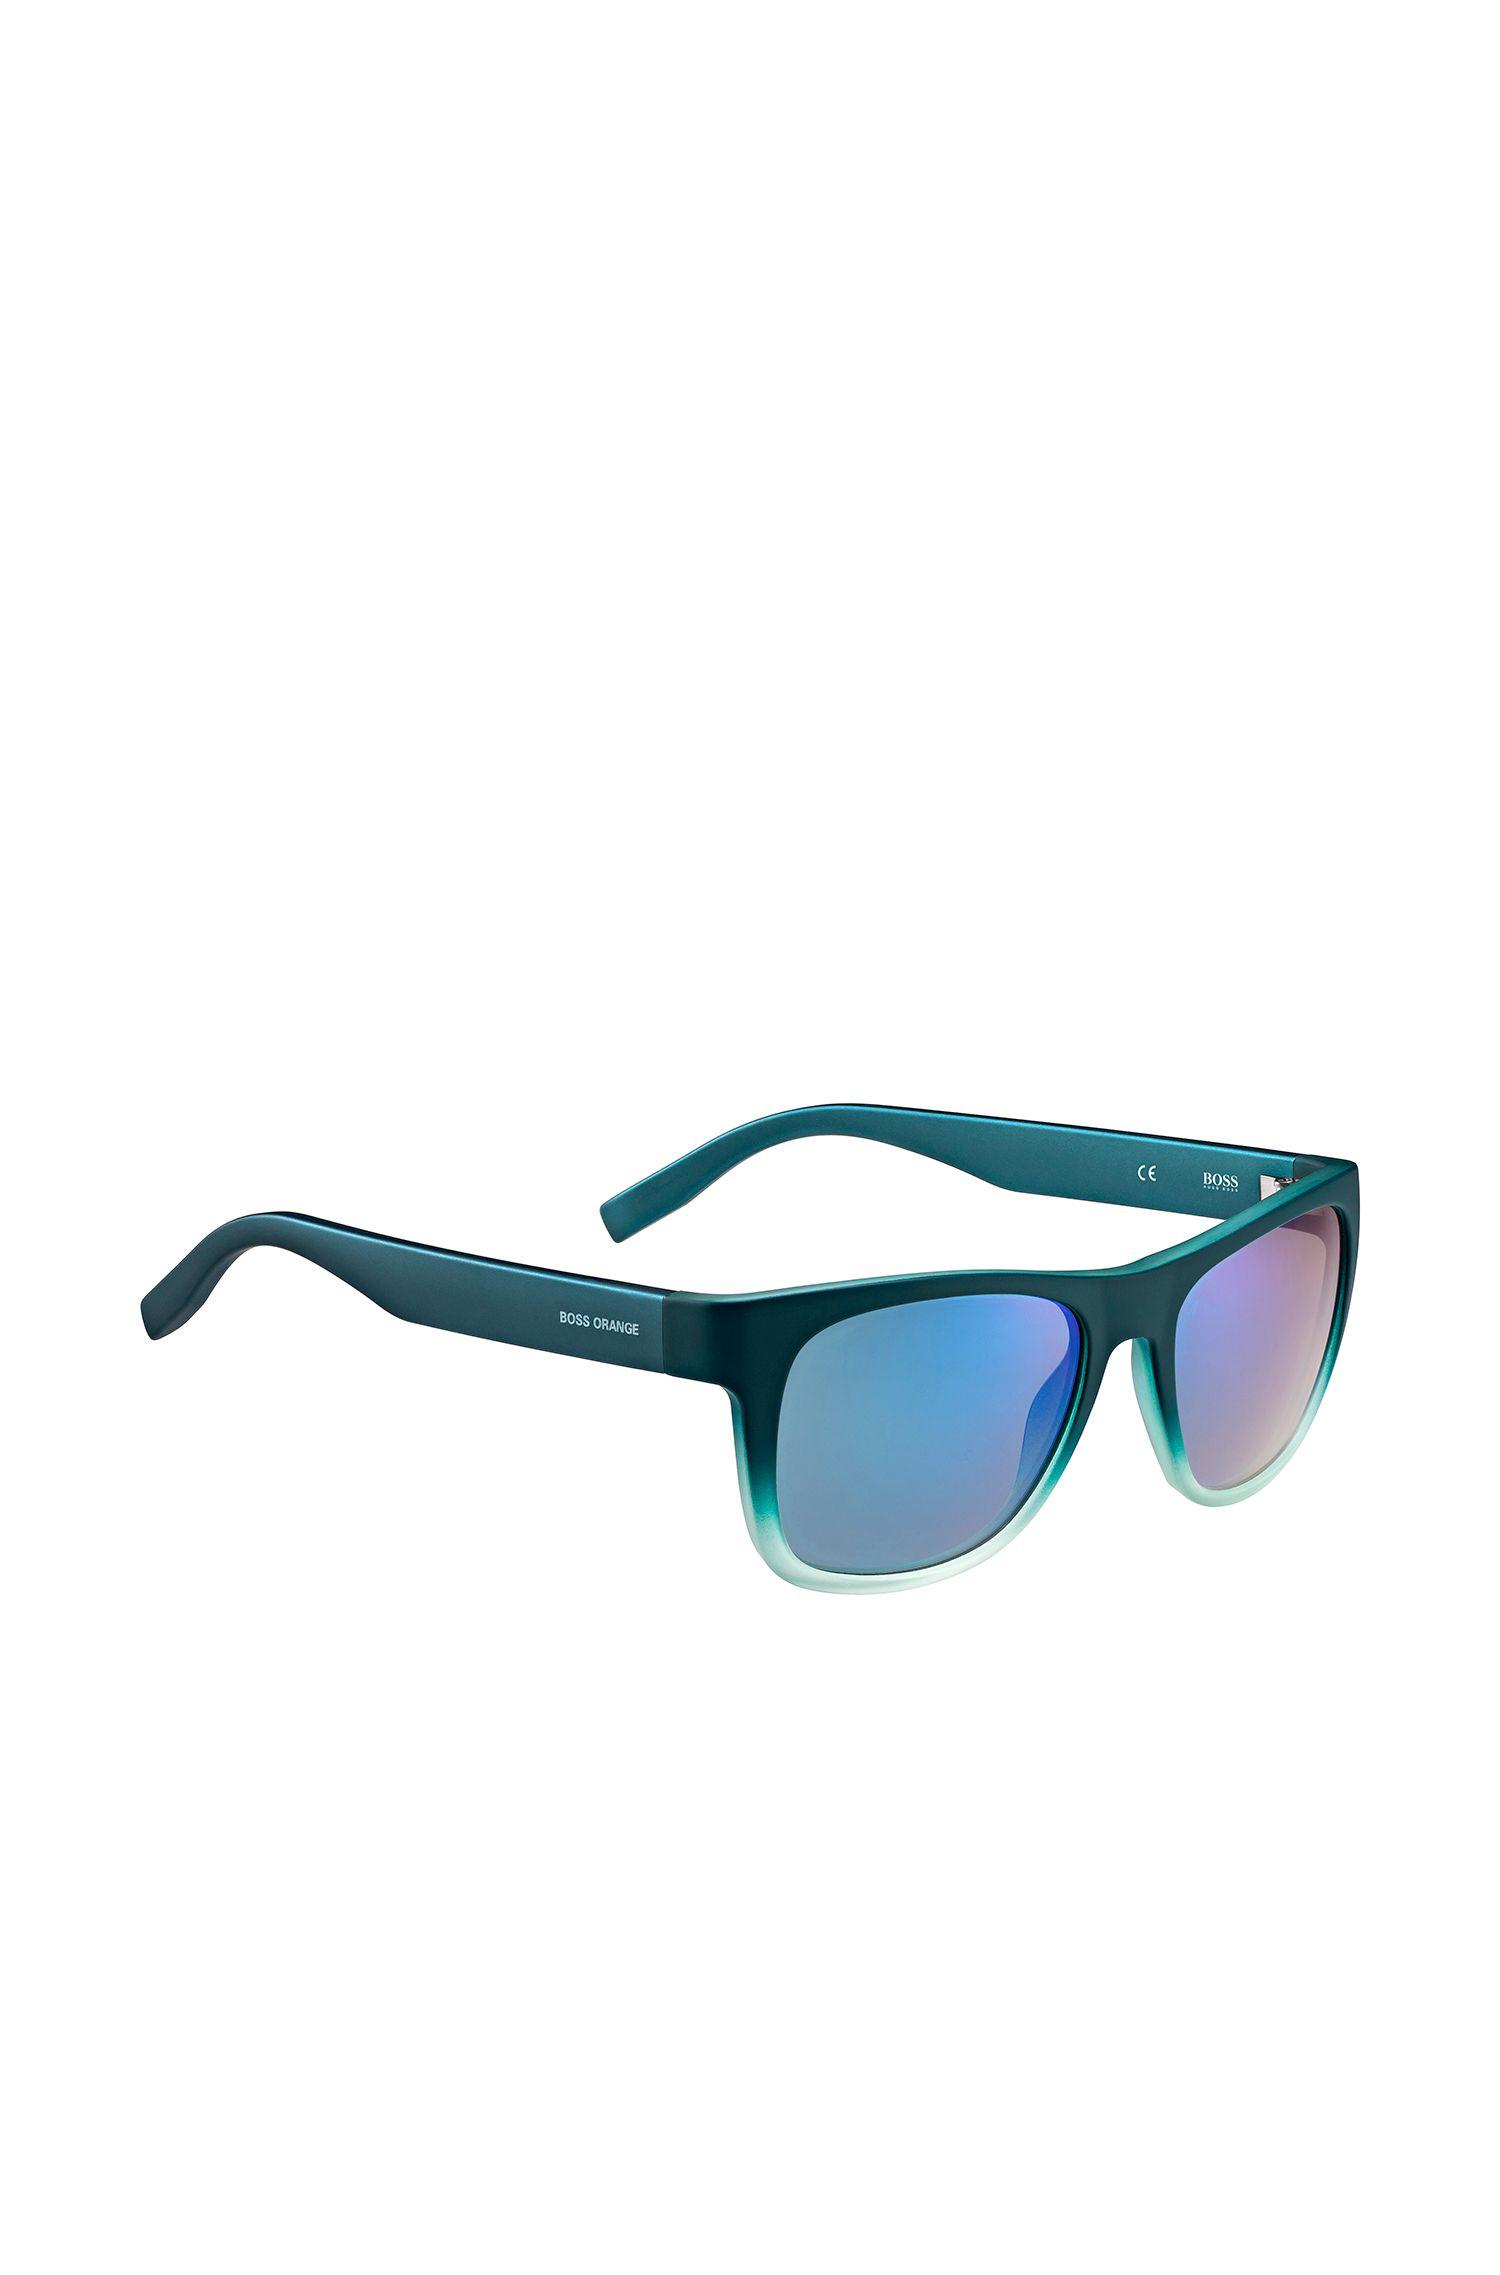 Petrolfarbene Sonnenbrille mit Fünf-Nieten-Scharnier: 'BO 0249/S'